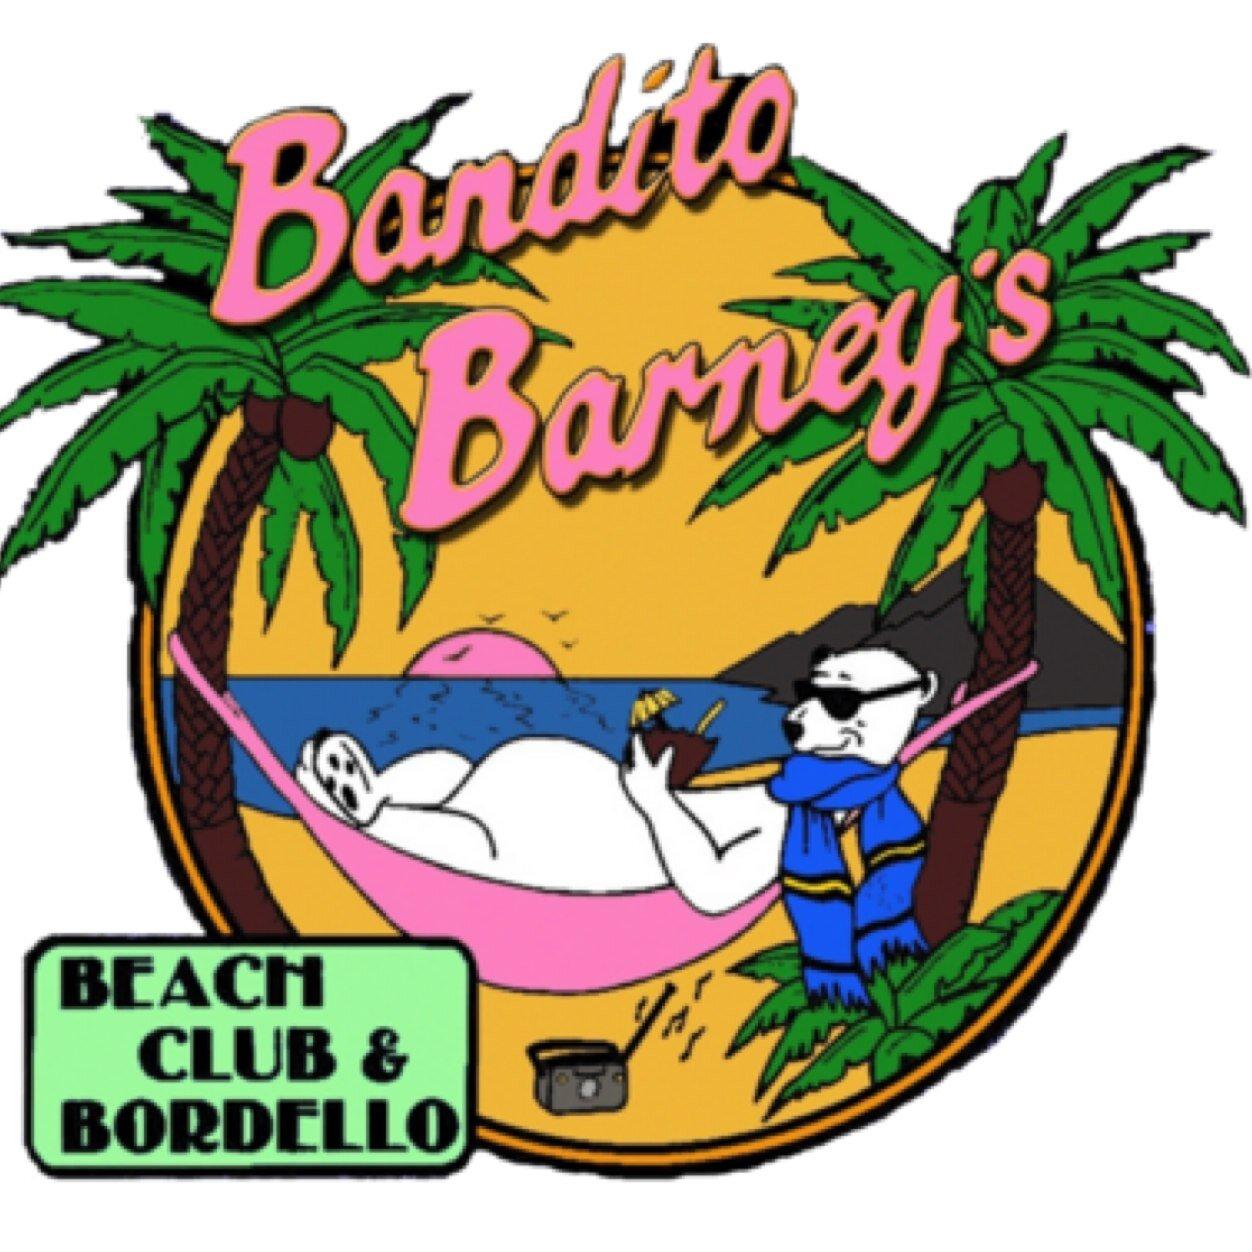 White pepper clipart banditos jpg transparent Bandito Barney\'s Beach Club (@Banditobarneys) | Twitter jpg transparent